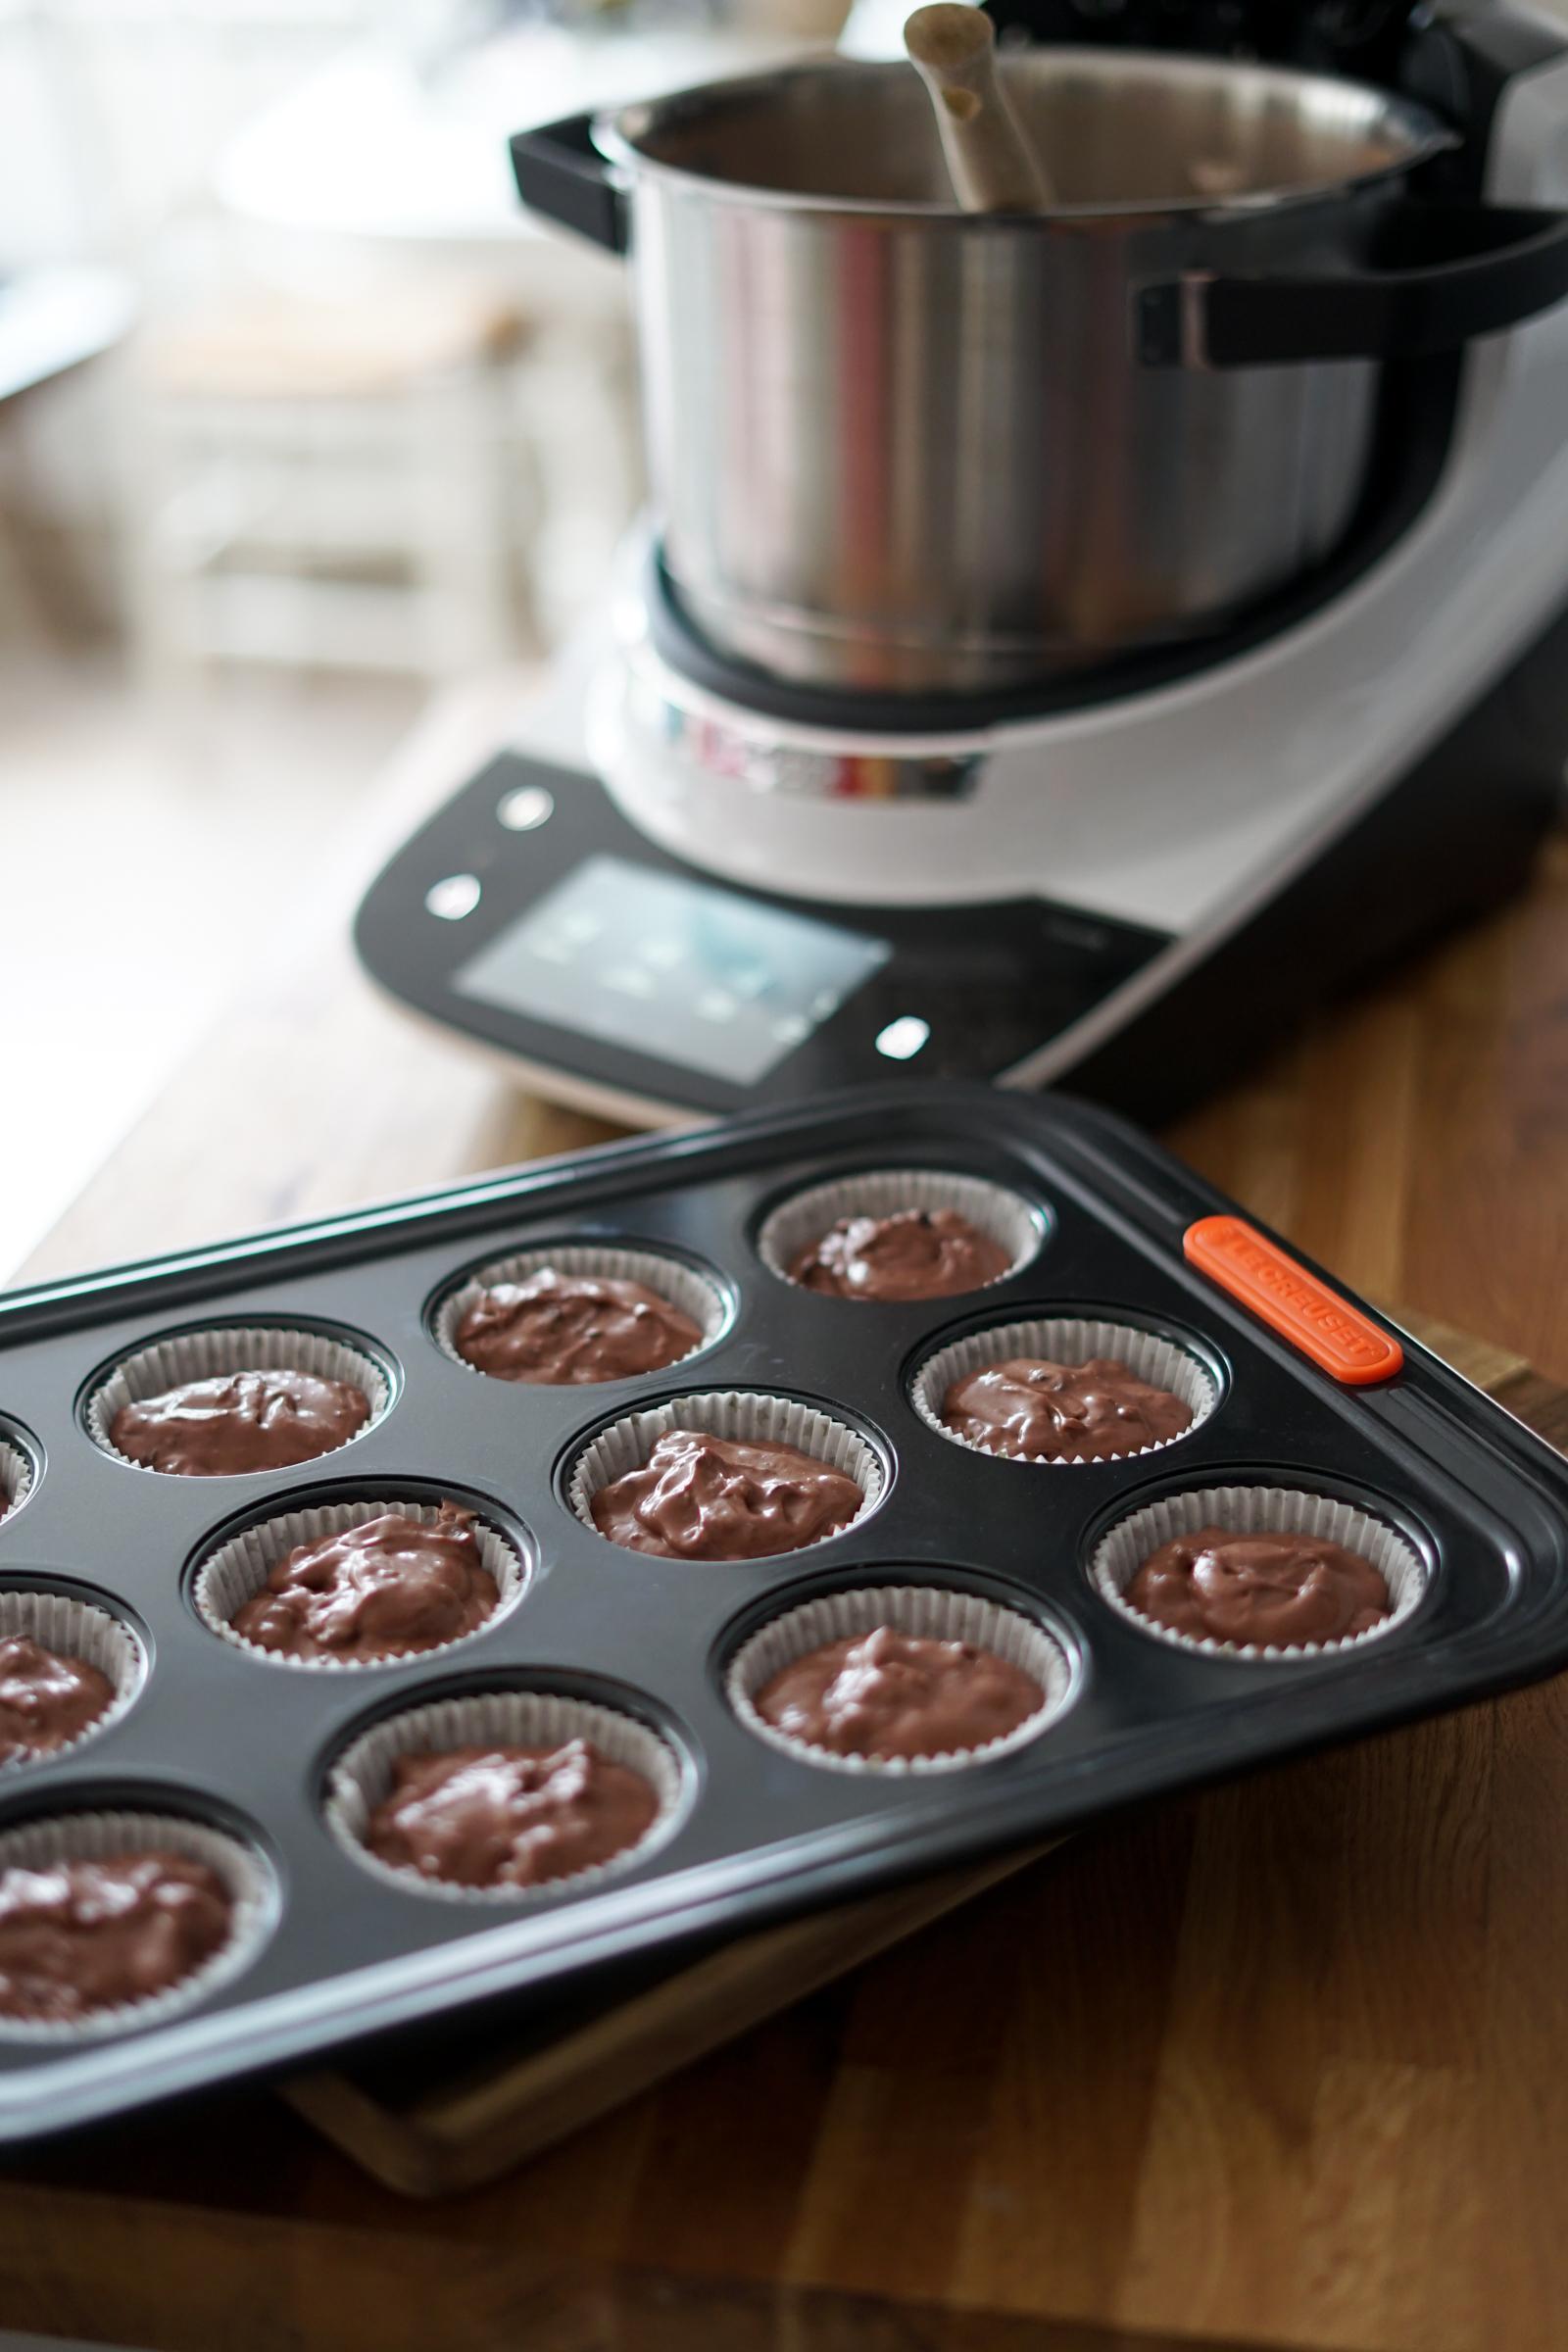 Recette Cupcake Chocolat Bosch Cookit 2